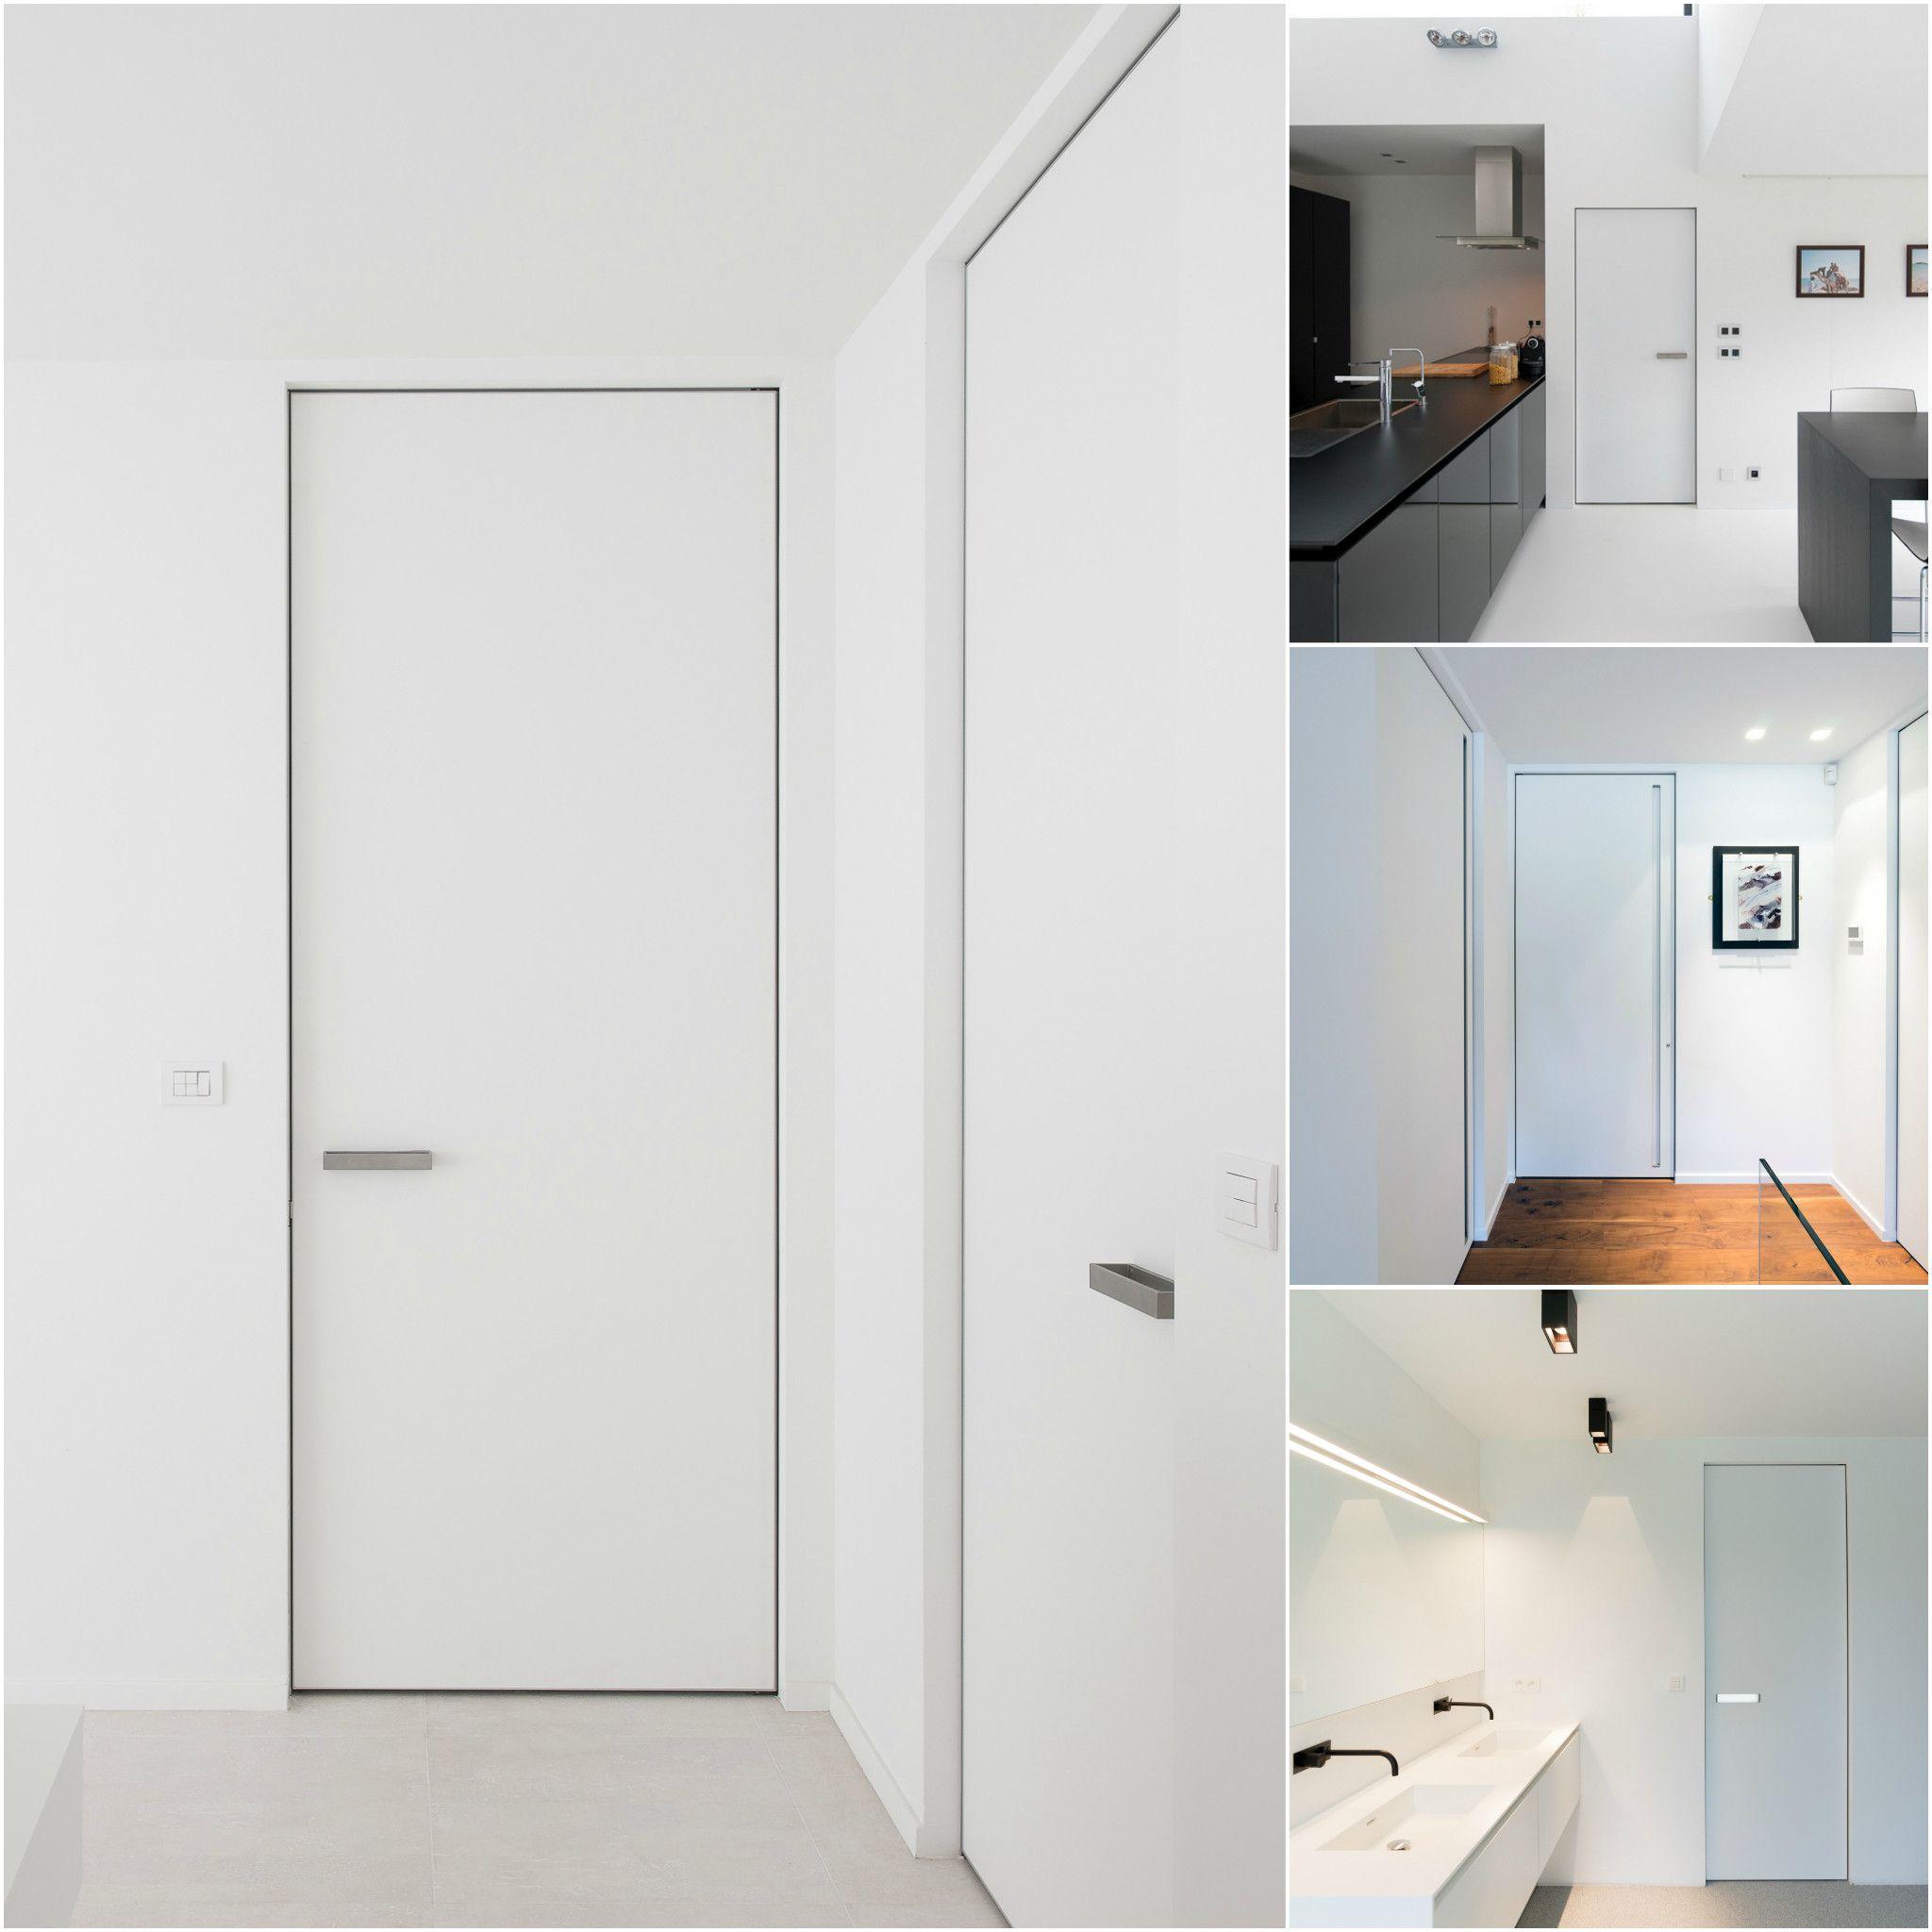 portes int rieures invisibles d 39 anyway doors la r f rence belge pour des portes int rieures. Black Bedroom Furniture Sets. Home Design Ideas